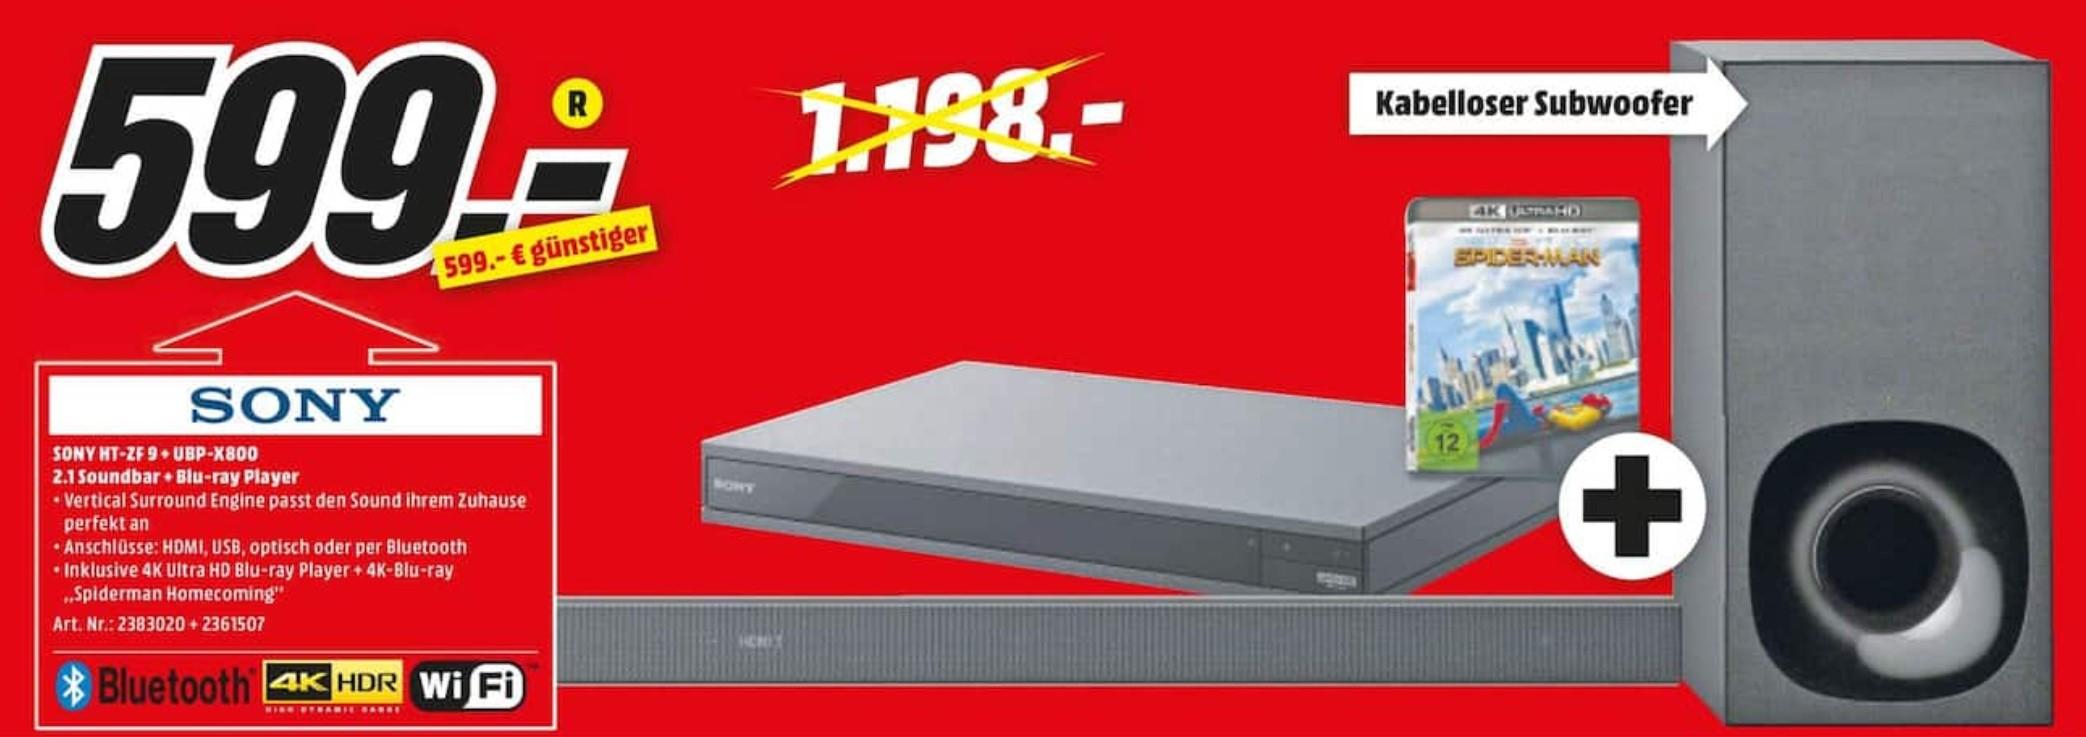 [LOKAL Magdeburg] Sony HT-ZF9 + Sony UBP-X800 4K Blu-Ray Player + Spiderman Homecoming 4K-Blu-Ray